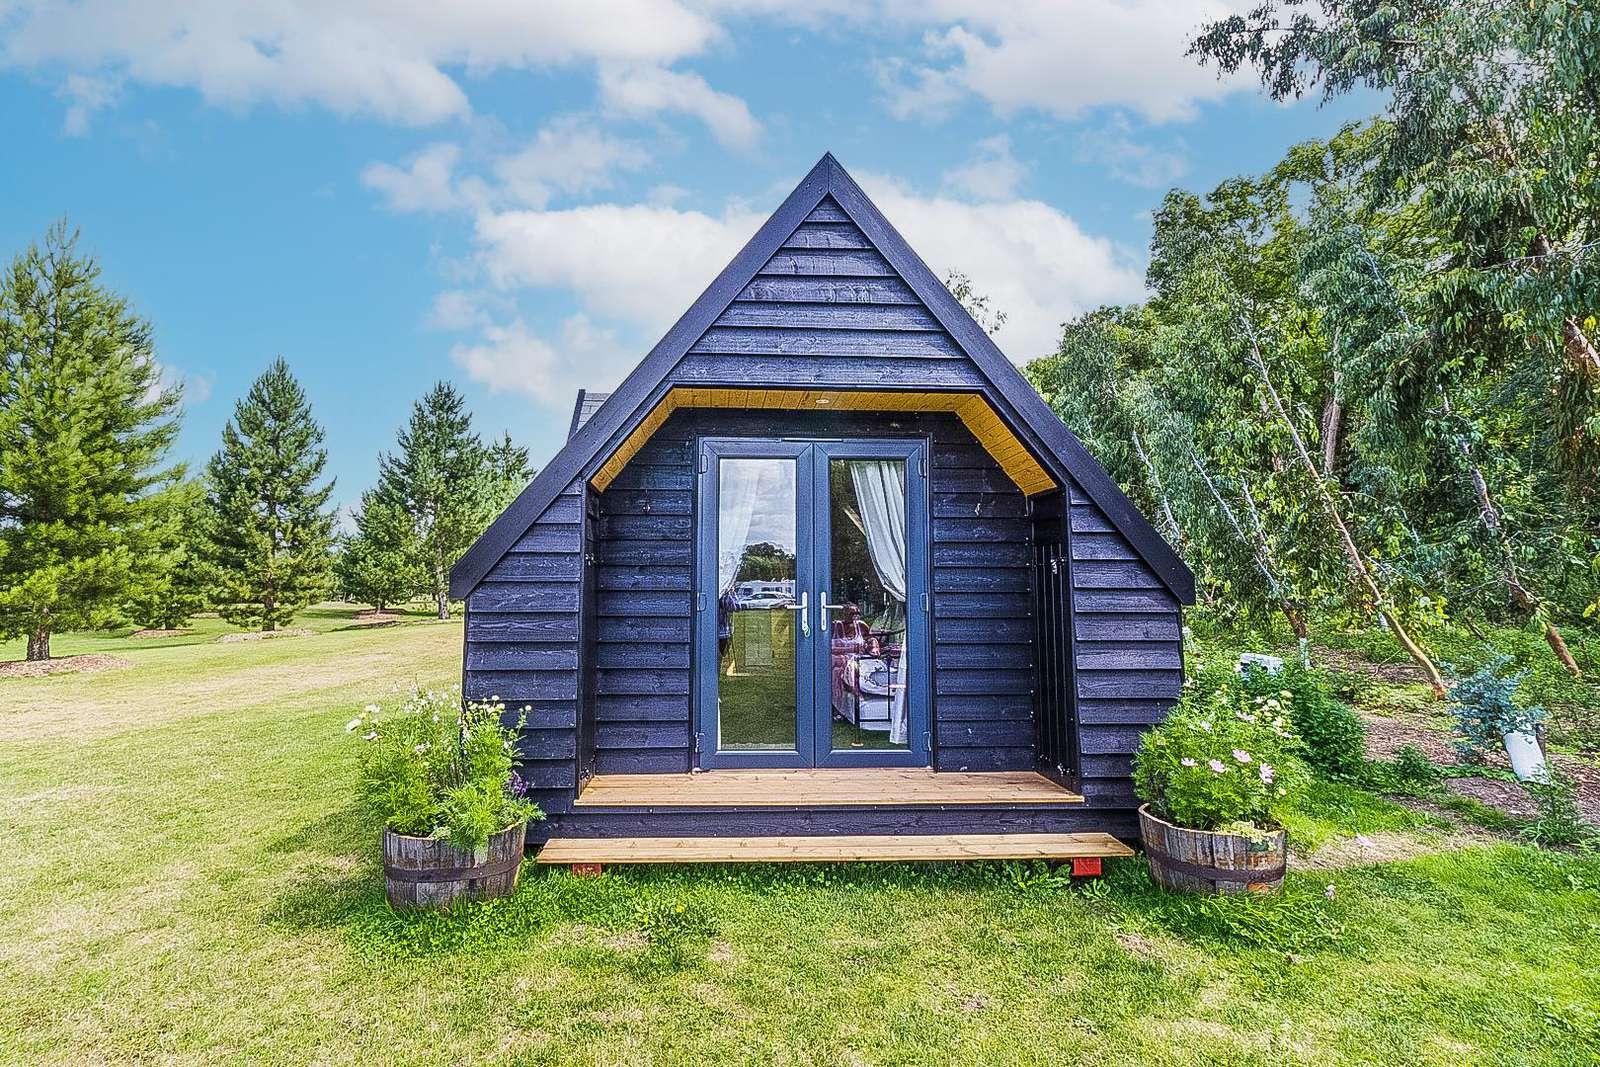 24001L – Lavender Cabin, 2 berth studio cabin at Fendick Fisheries. Diamond-Plus rated. - property